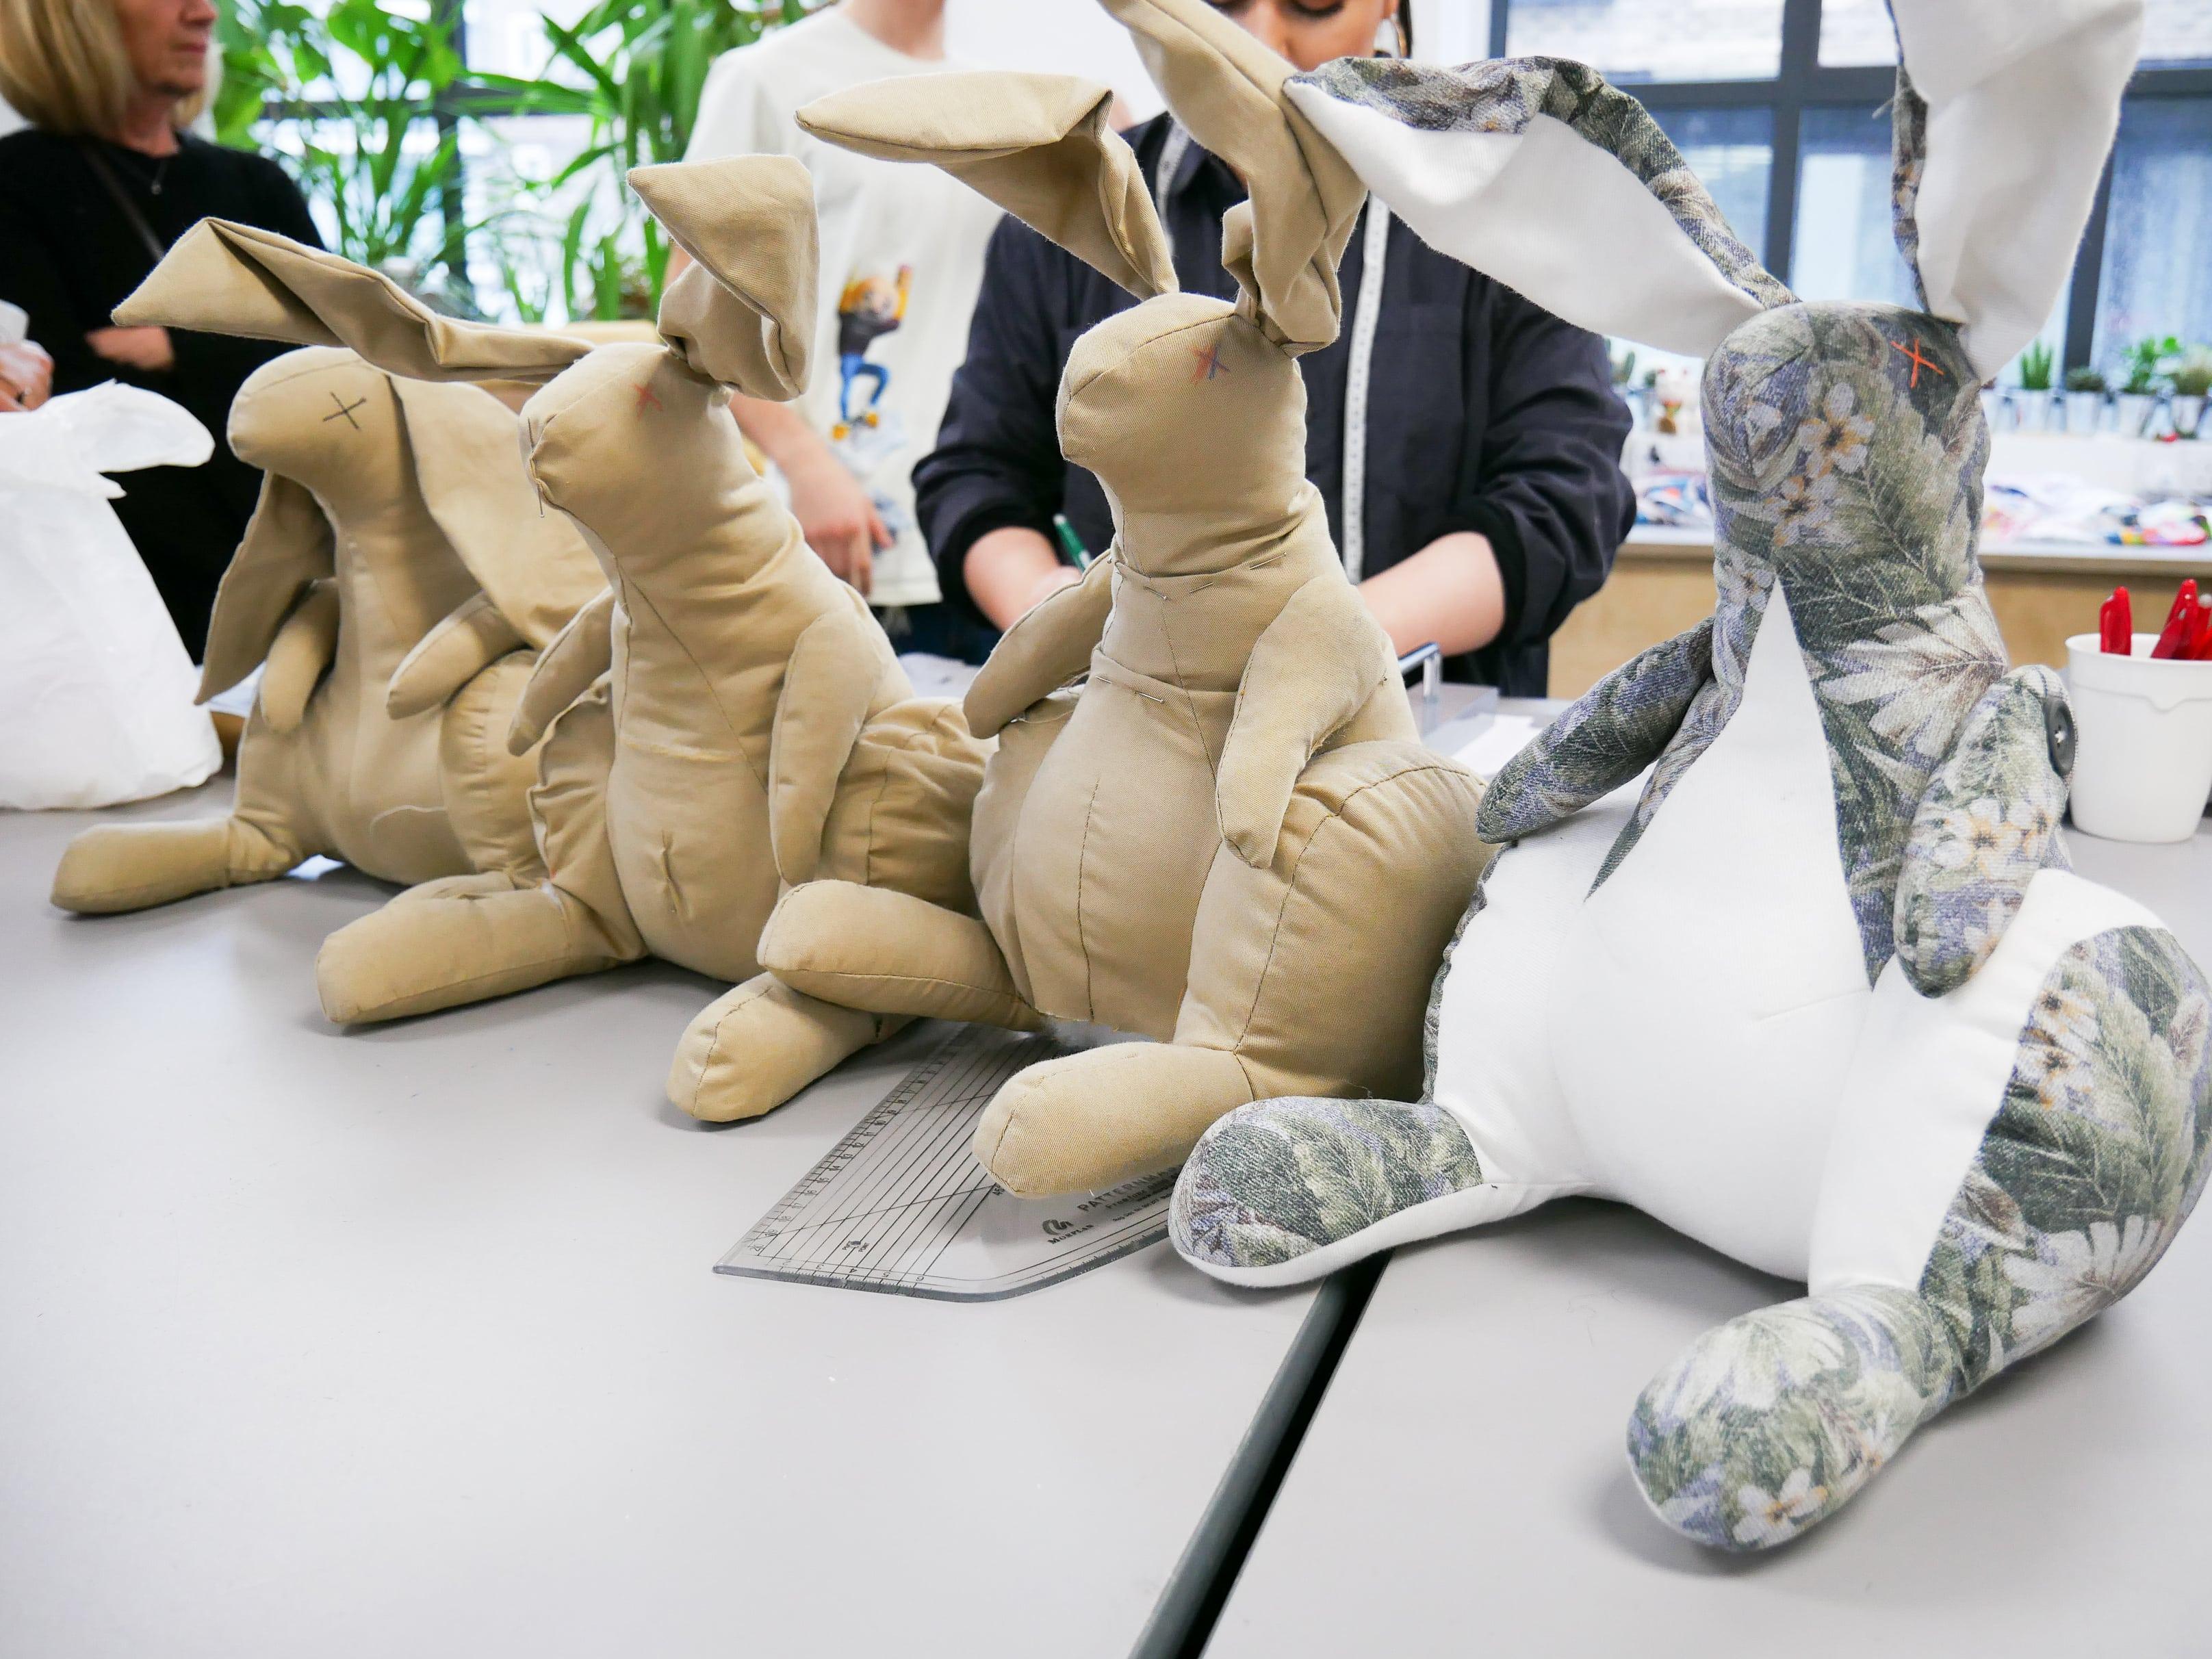 Christopher Raeburn stuffed animals